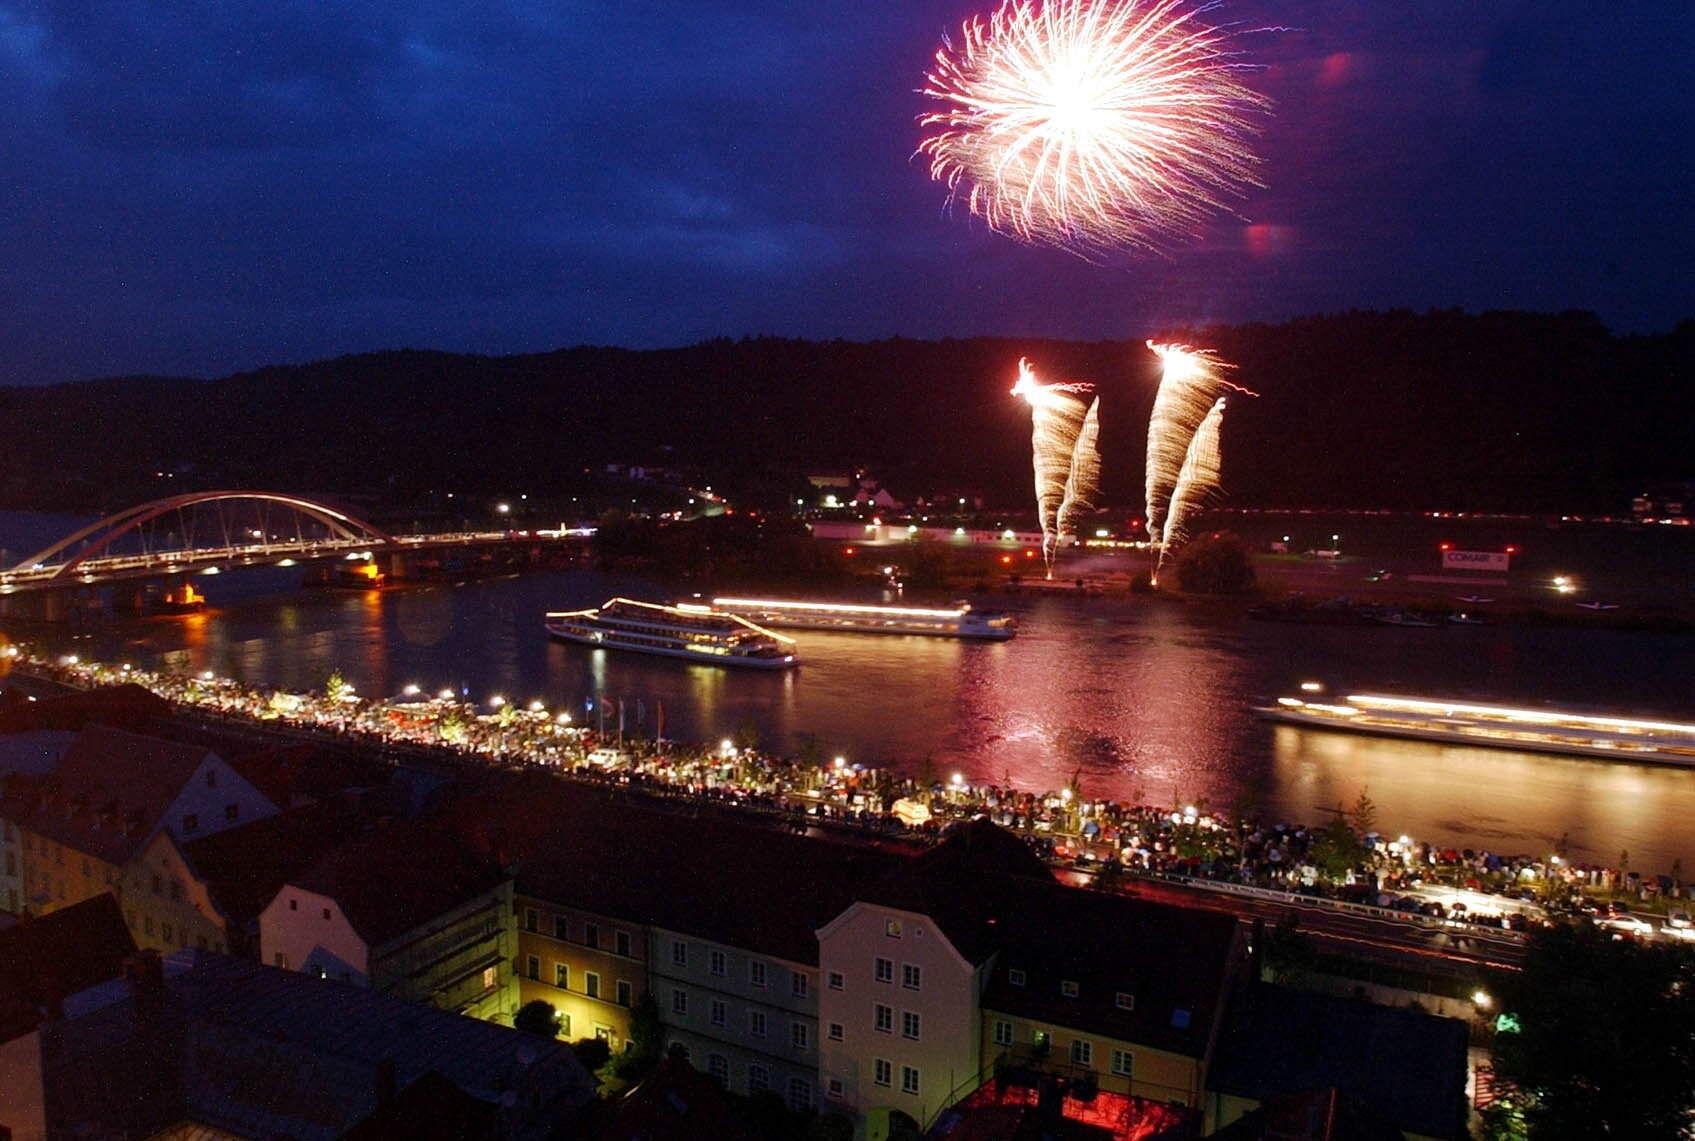 Donau in flammen vilshofen 2020